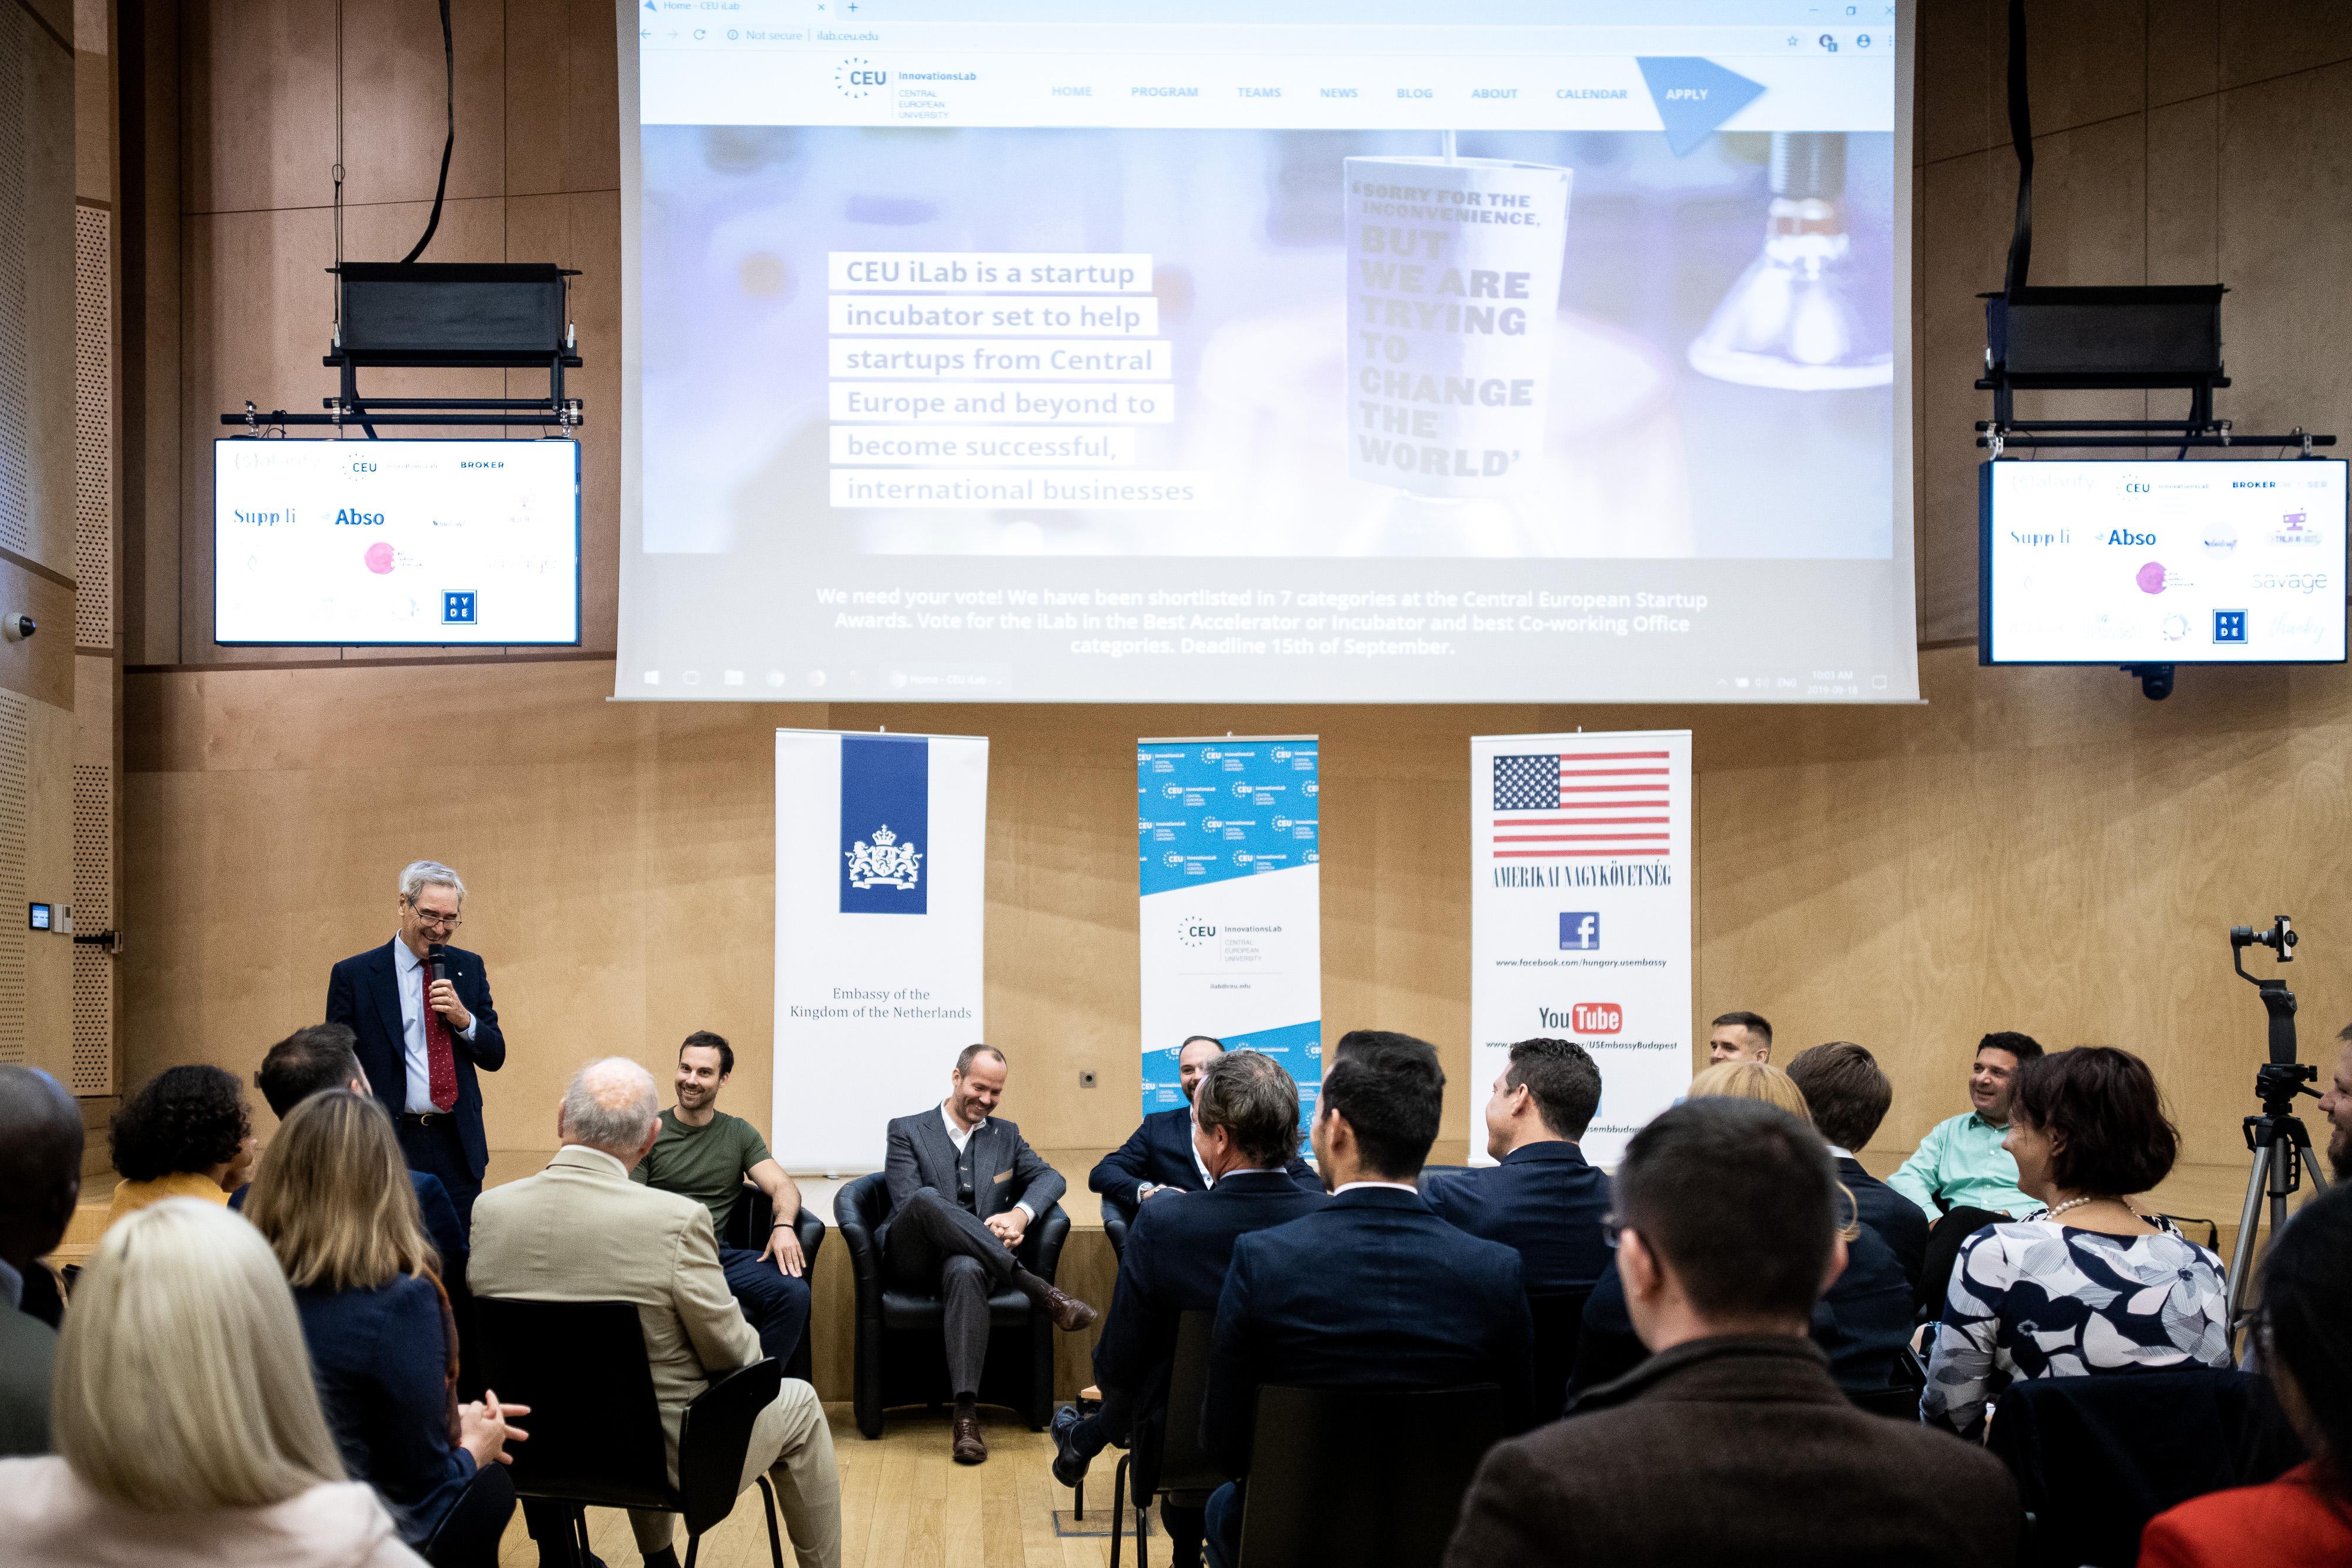 CEU President and Rector Michael Ignatieff welcomes the guests - Photo: CEU / Kepszerkesztoseg (Andras Dimeny)